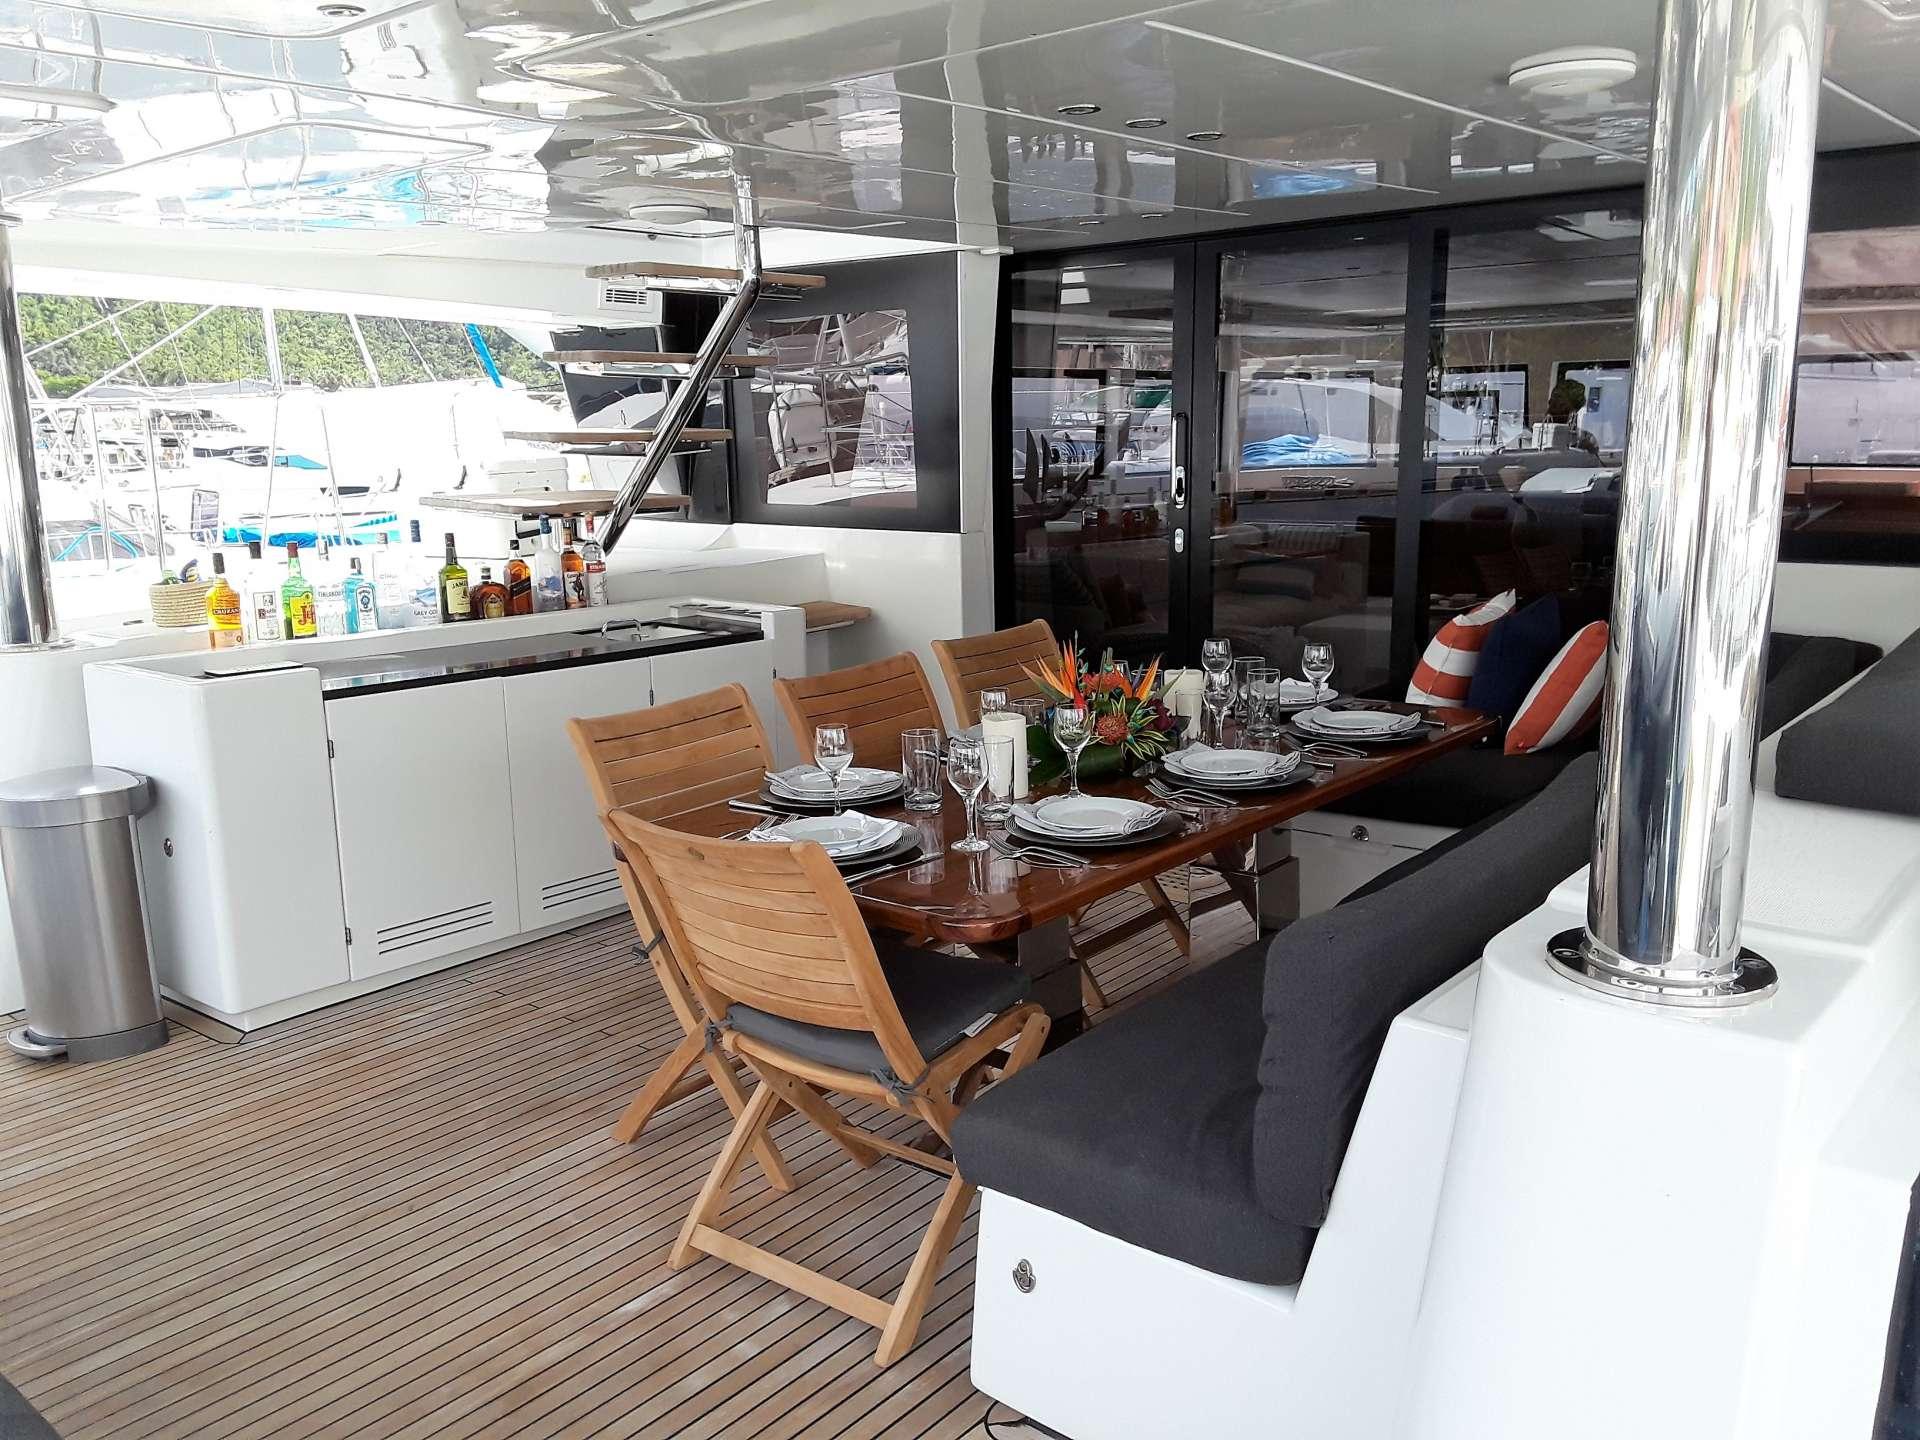 aft deck with wet bar